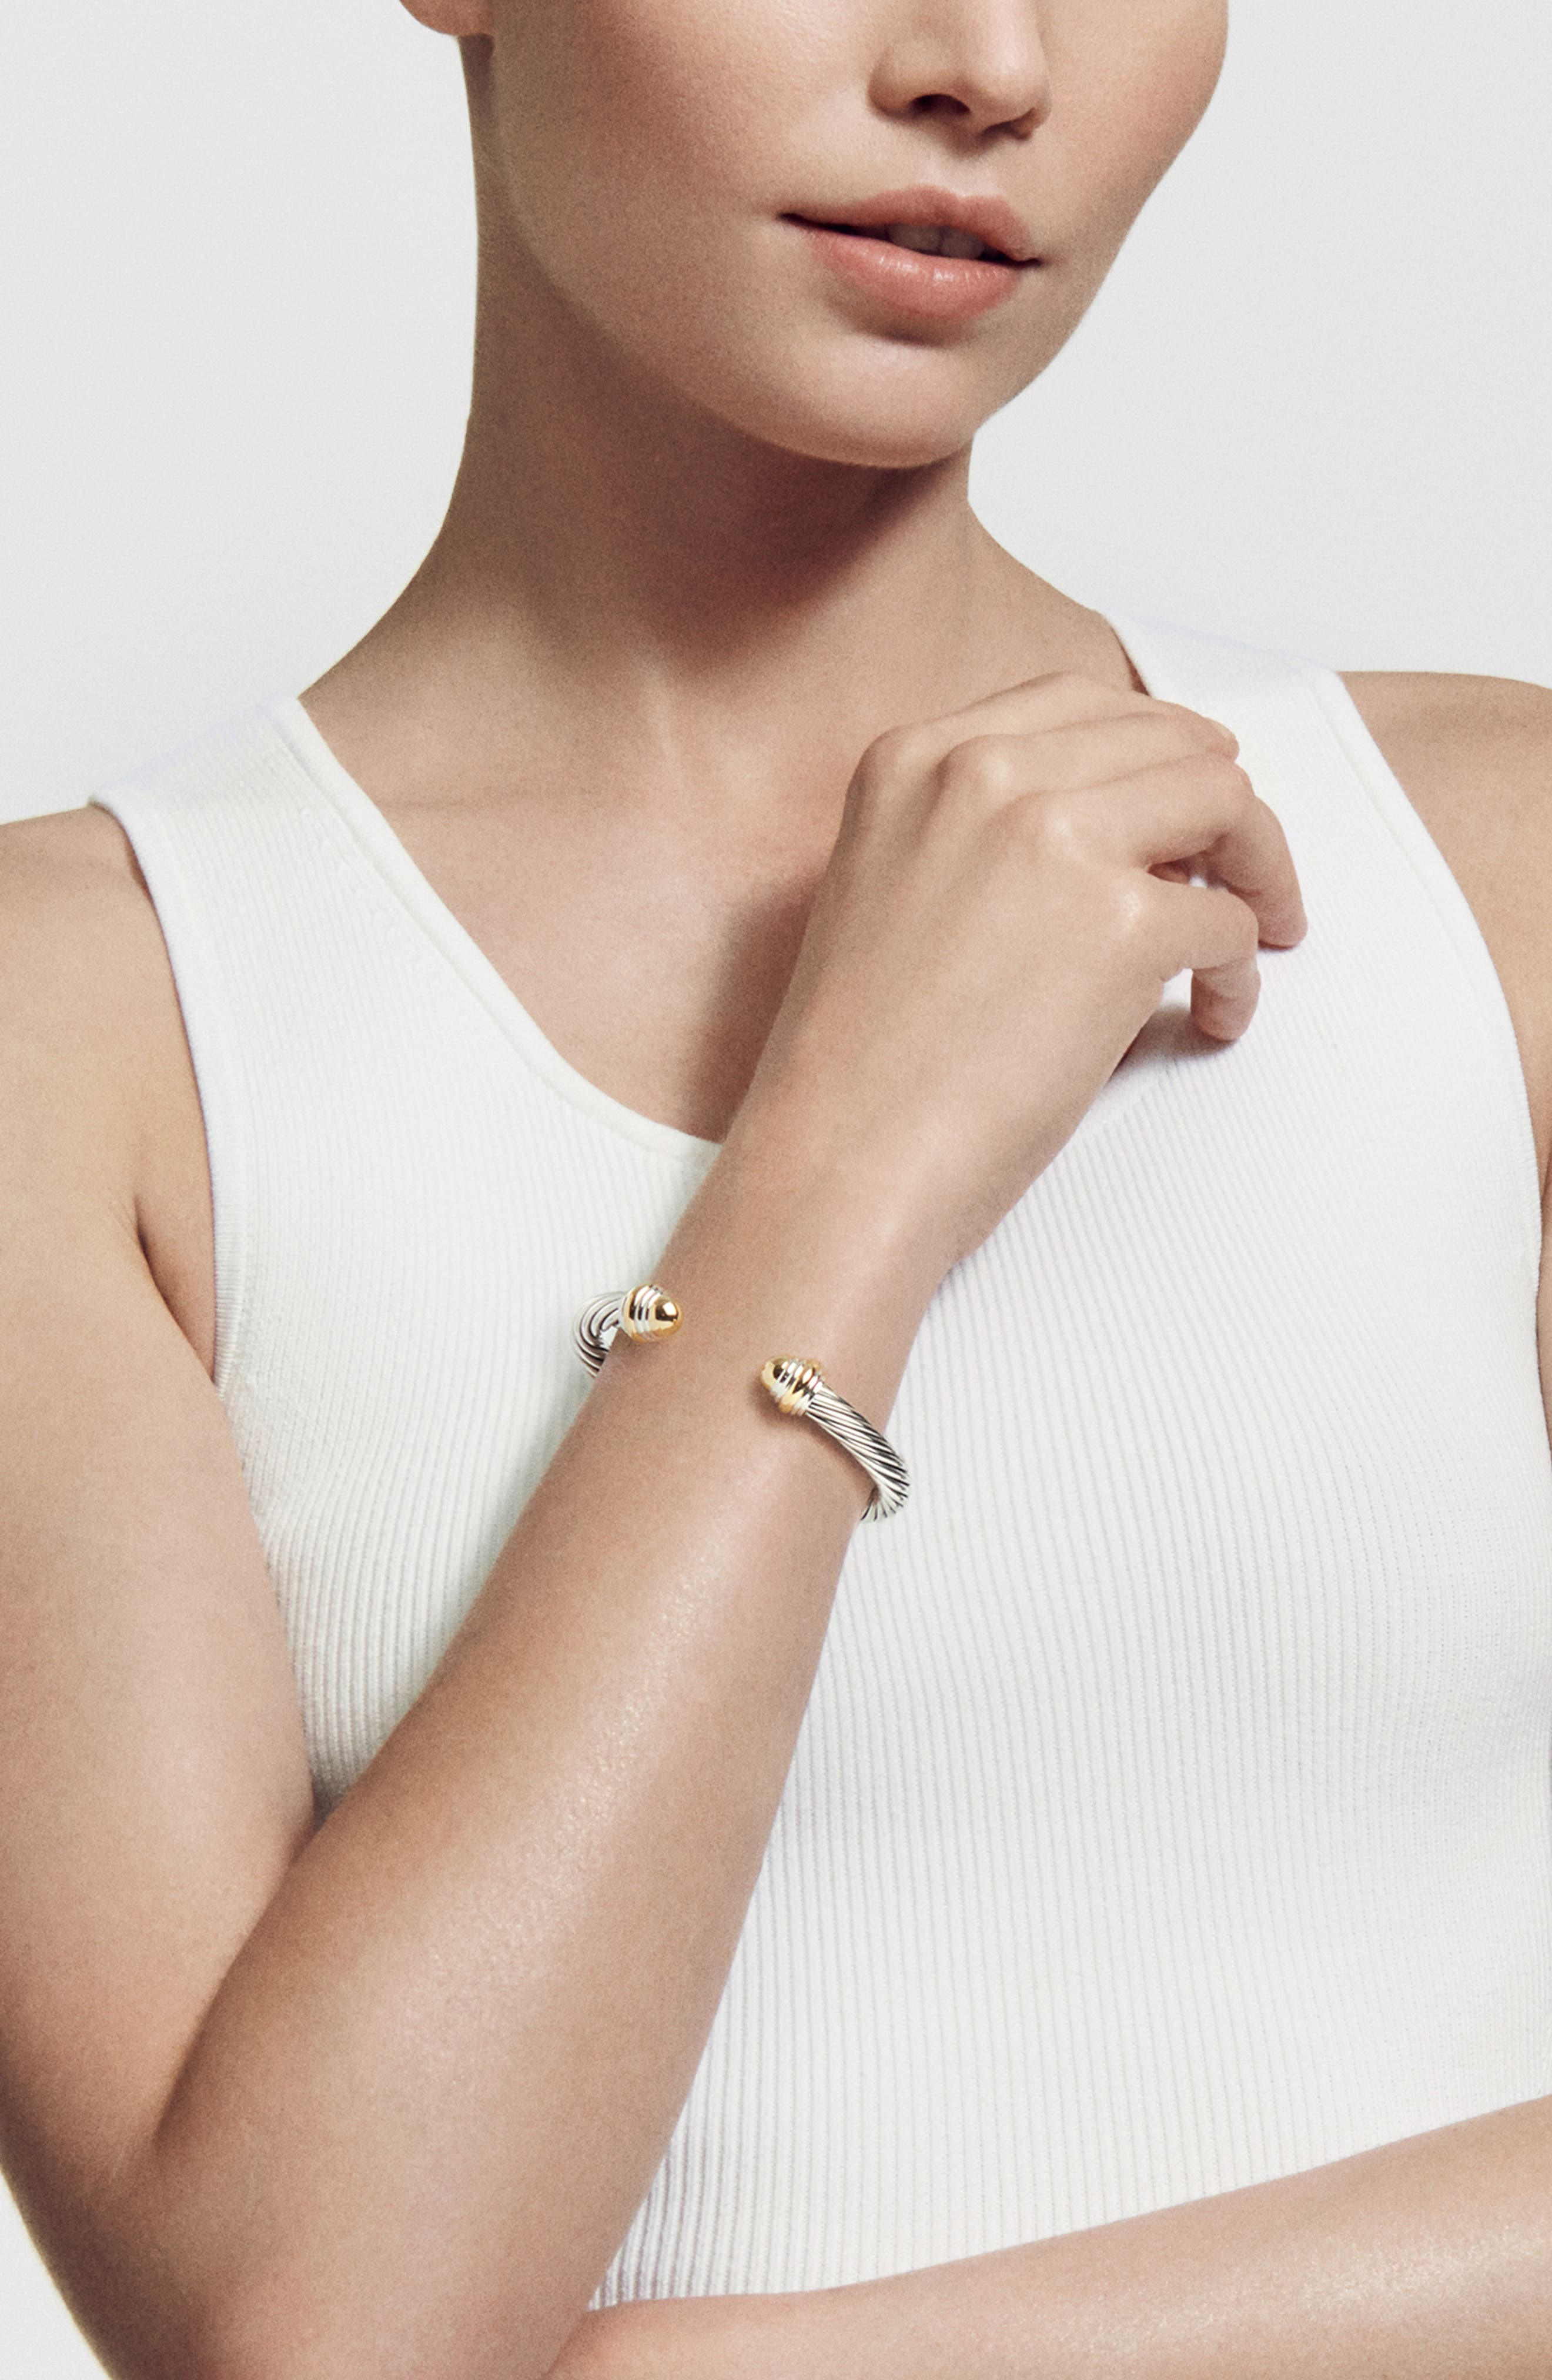 DAVID YURMAN, Cable Classics Bracelet with 14K Gold, 7mm, Alternate thumbnail 2, color, GOLD DOME